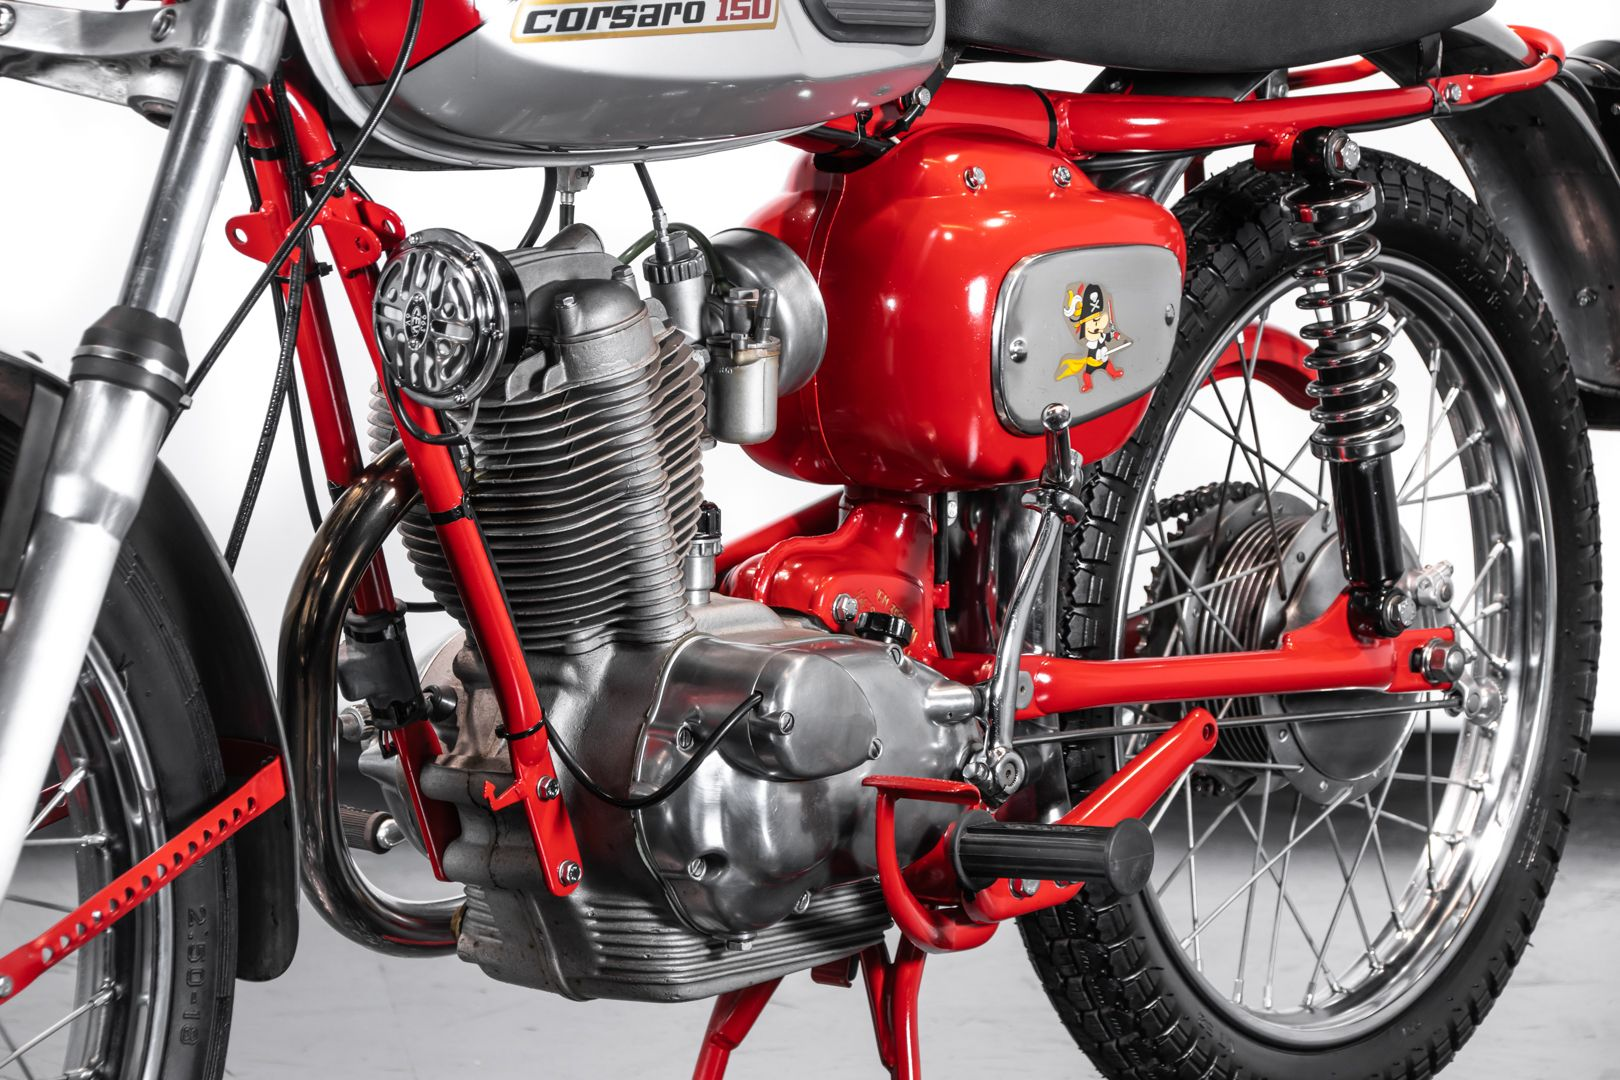 1971 Moto Morini Corsaro SS 150 77725